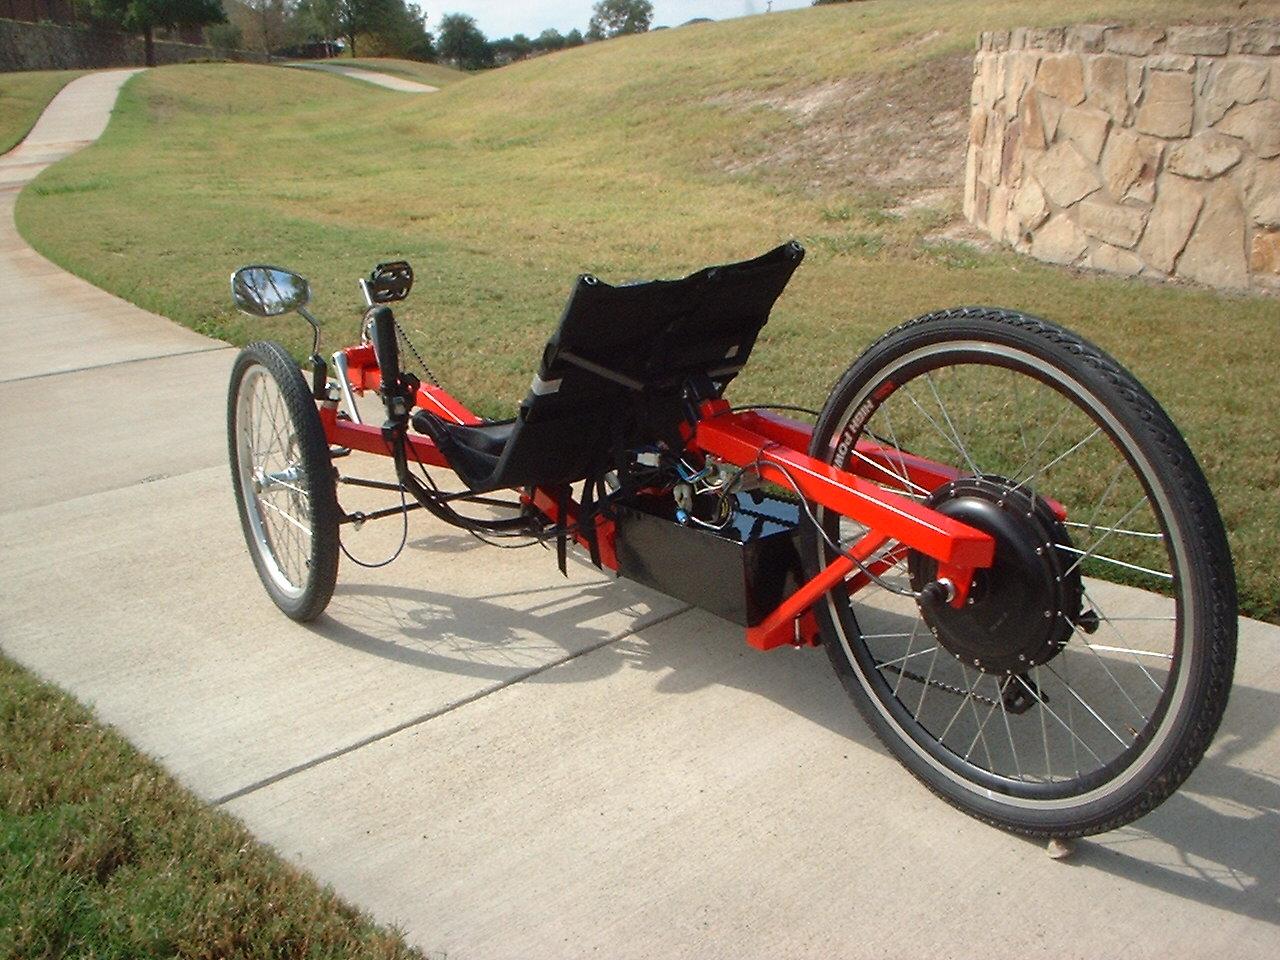 speed trike 1?w=604&h=453 motorized trikes tadpole rider Rat Rod Trikes at webbmarketing.co